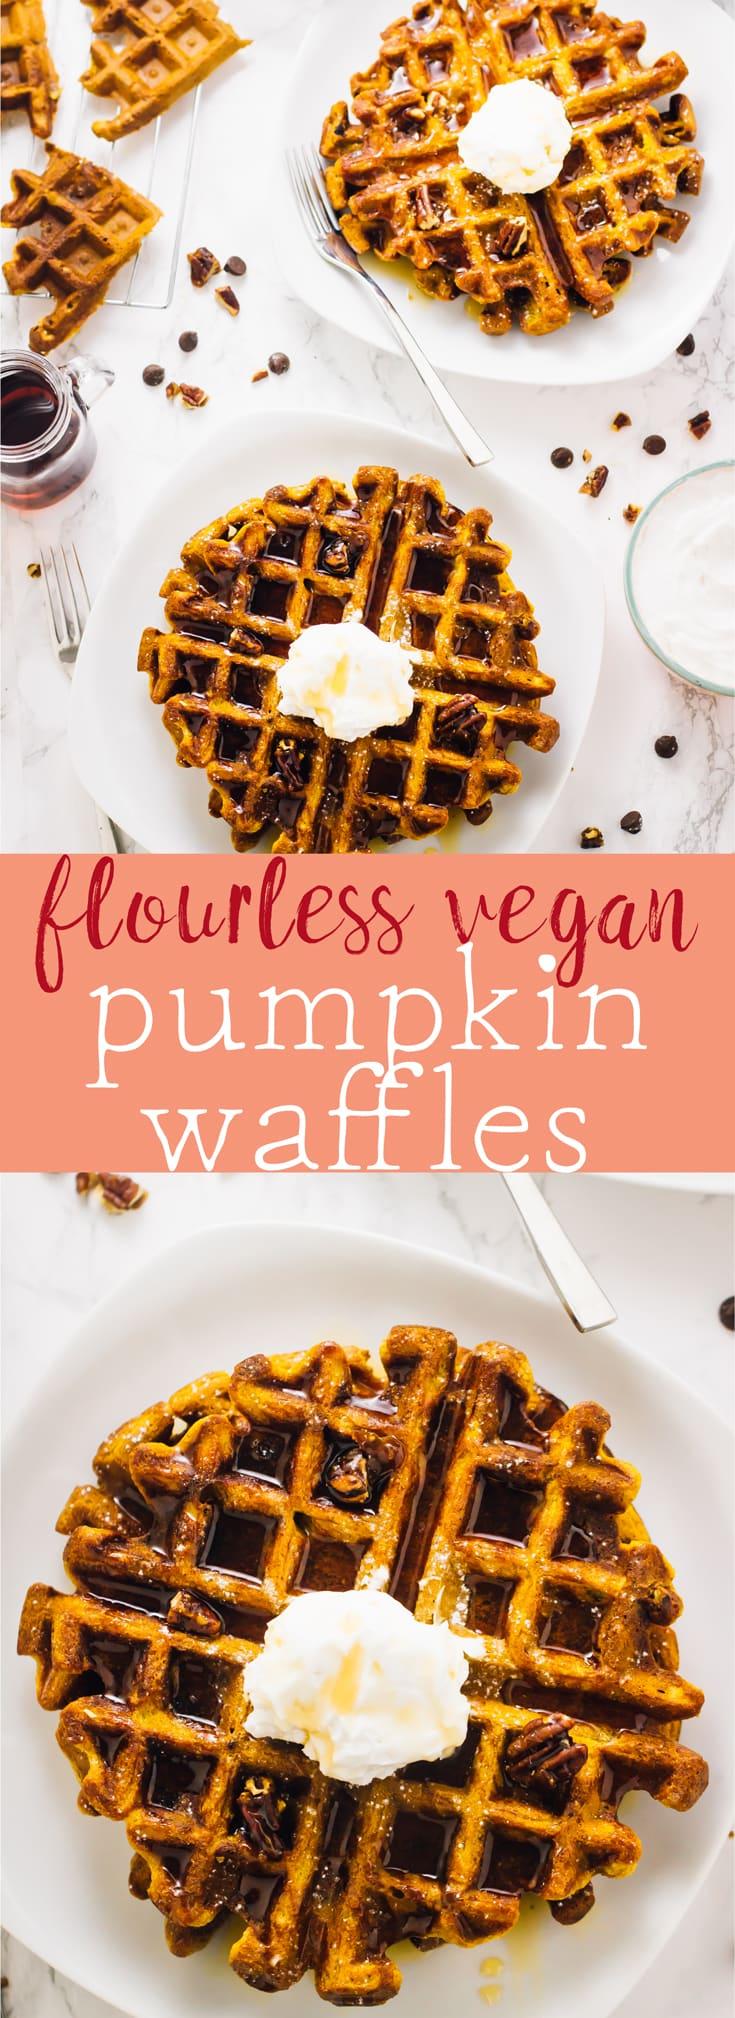 Gluten Free Vegan Pumpkin Waffles (Video) Jessica In The